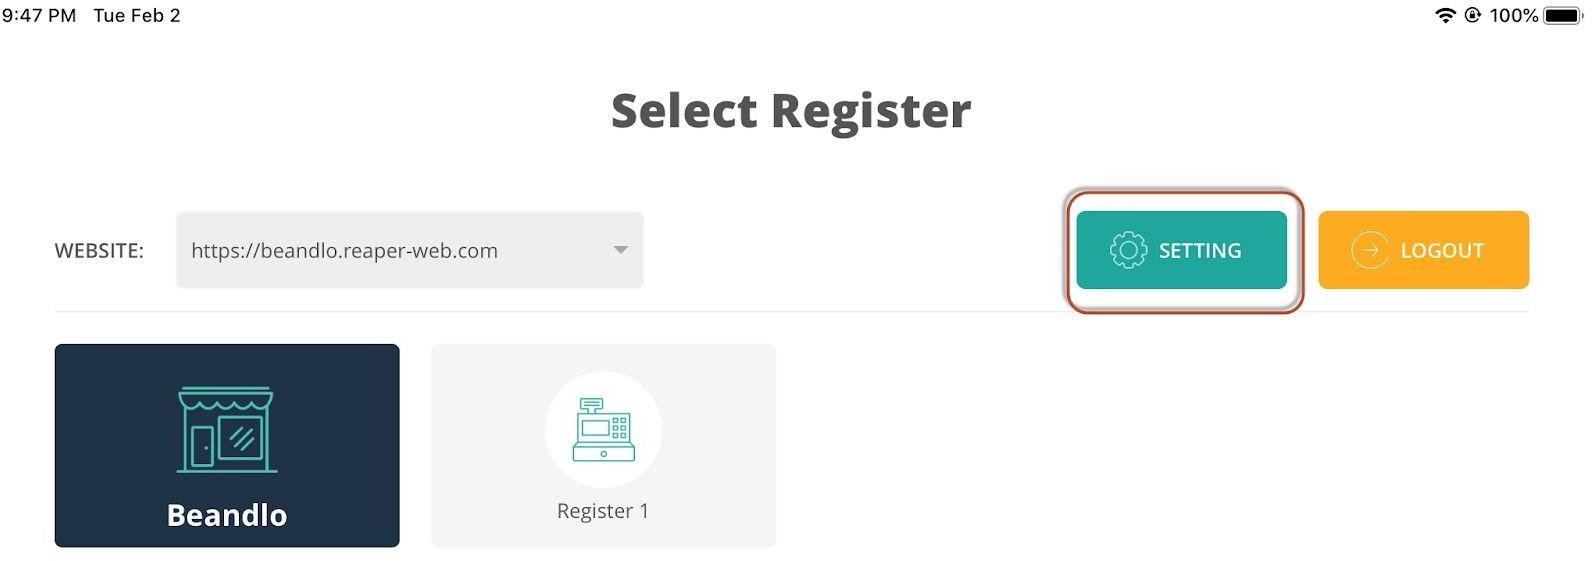 connectpos register screen